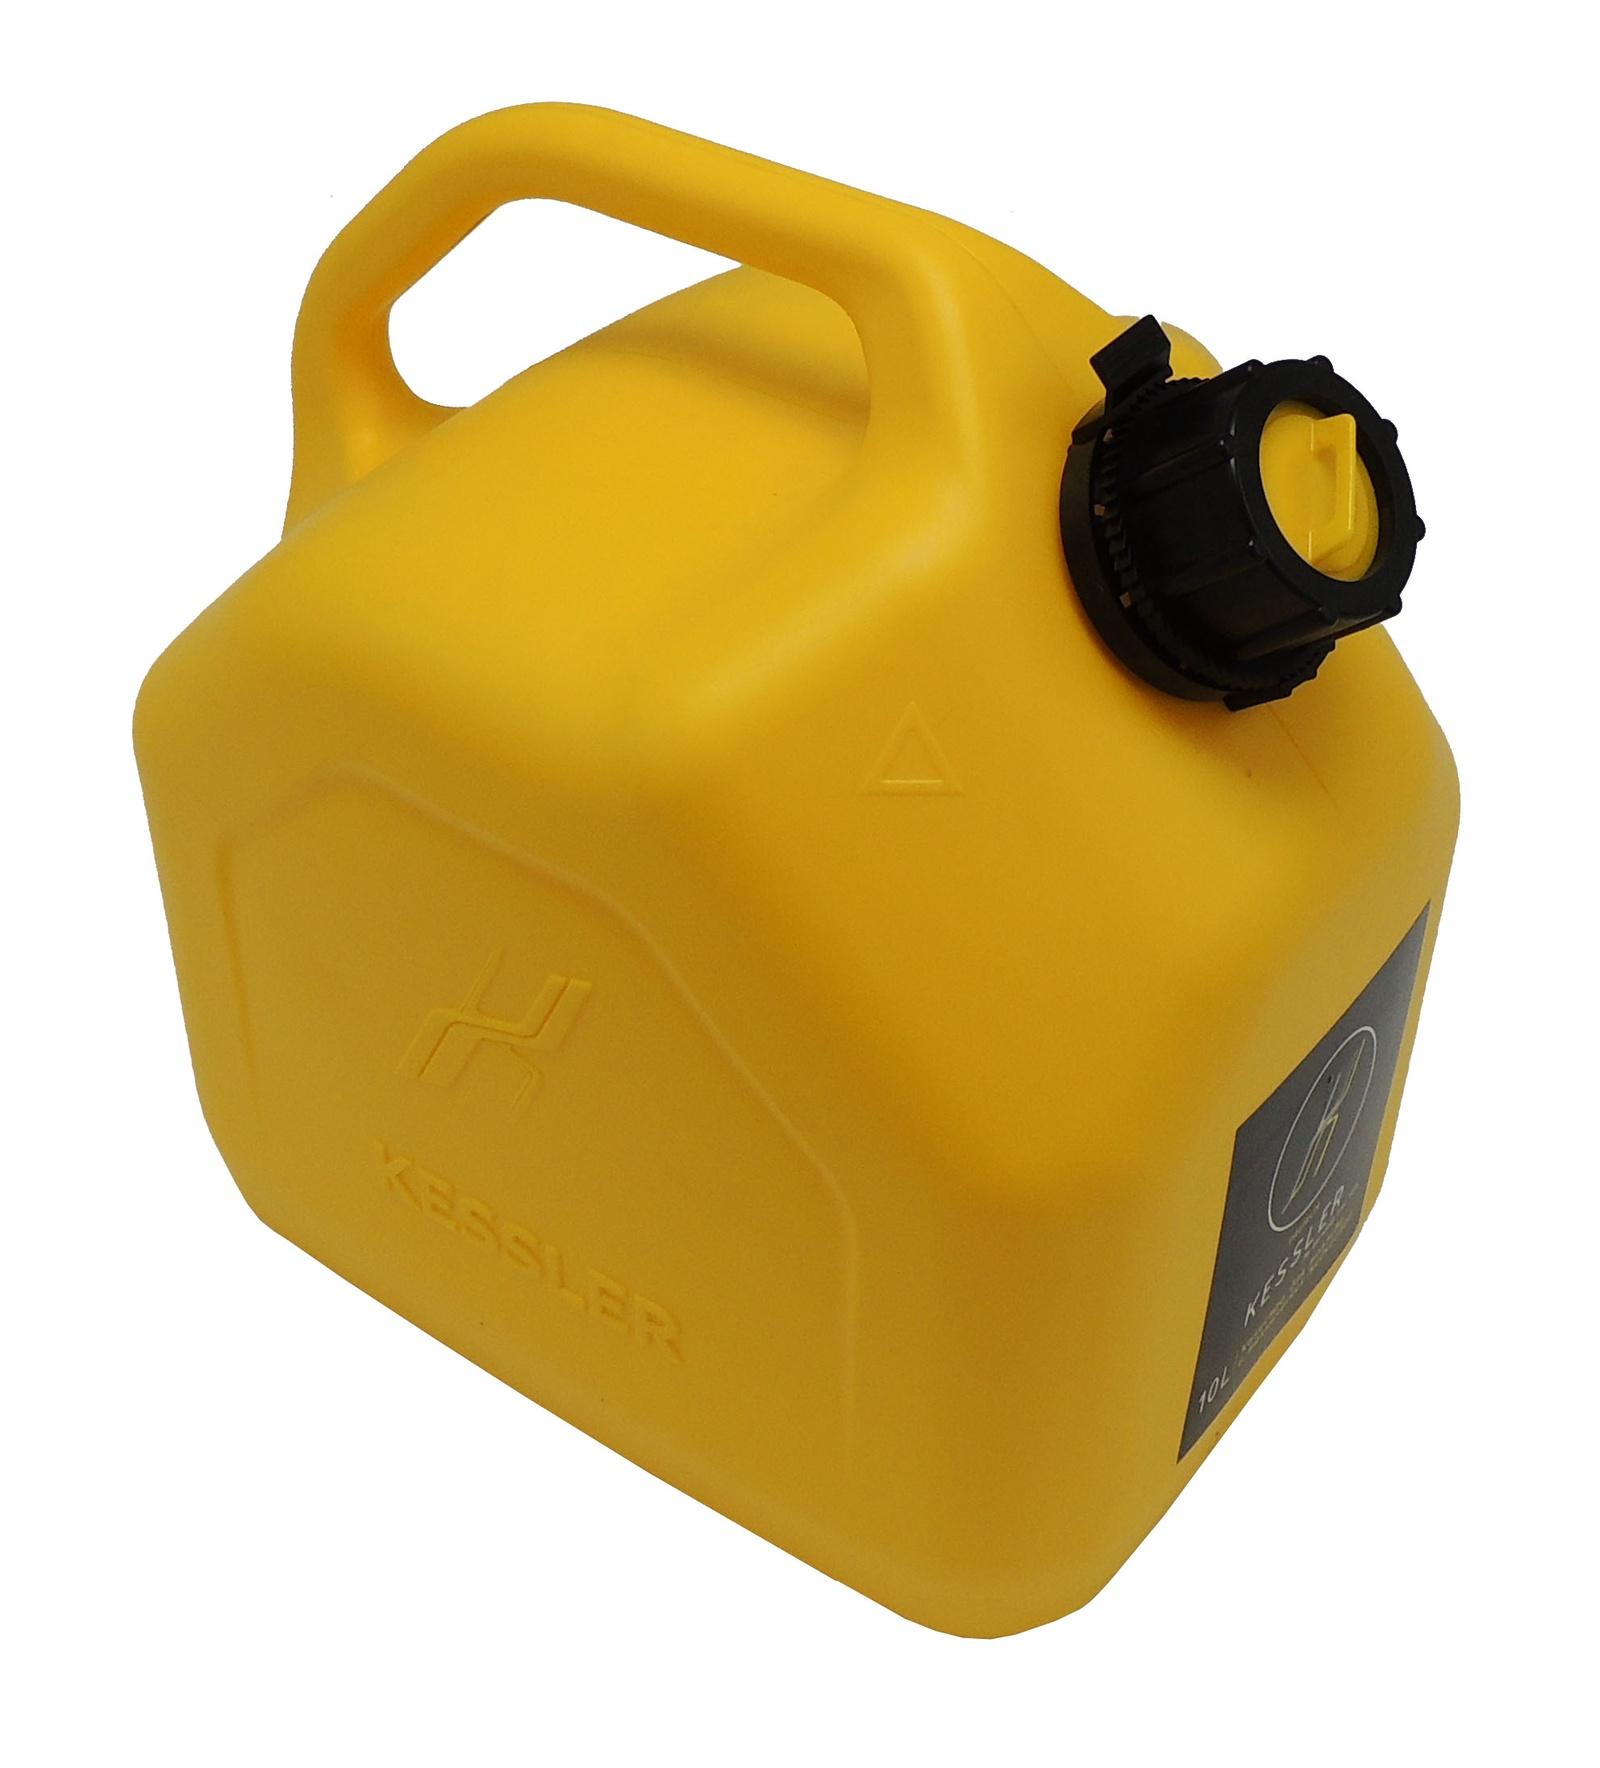 Канистра для бензина KESSLER А1-02-02, желтый sarah kessler fuchy dzieła zlecenia